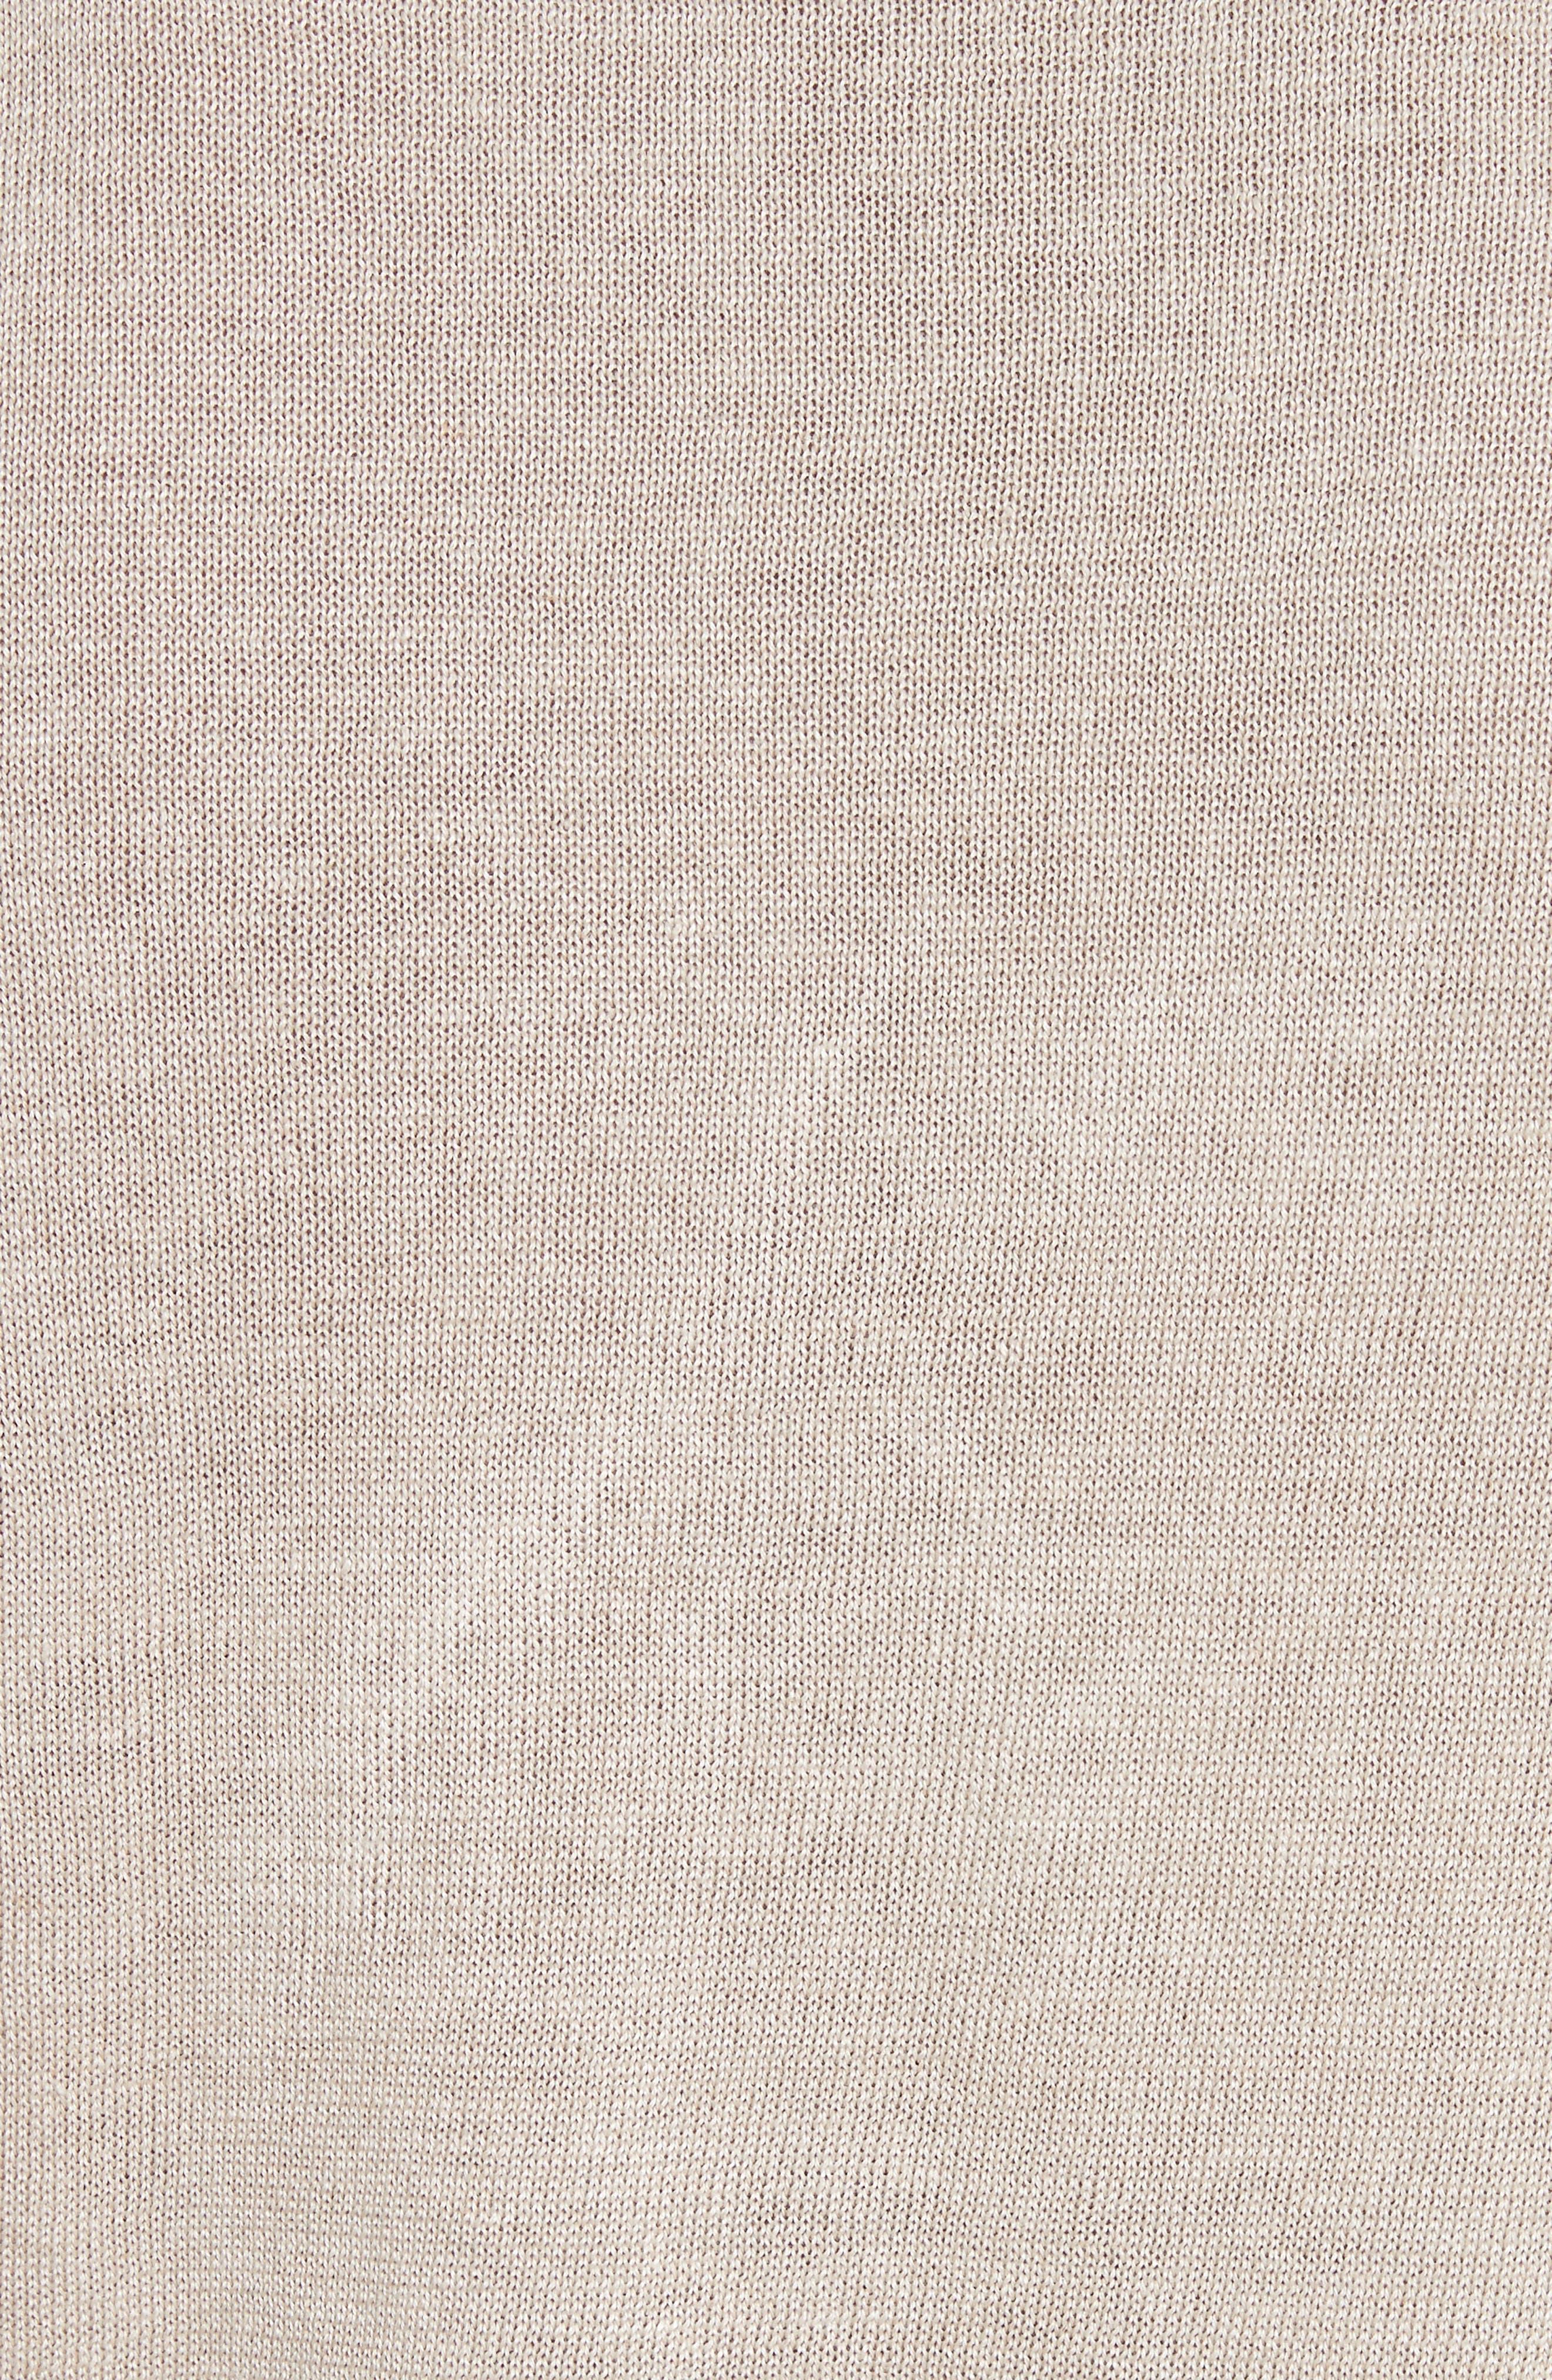 Exford Linen Crewneck Sweater,                             Alternate thumbnail 5, color,                             Light Sand